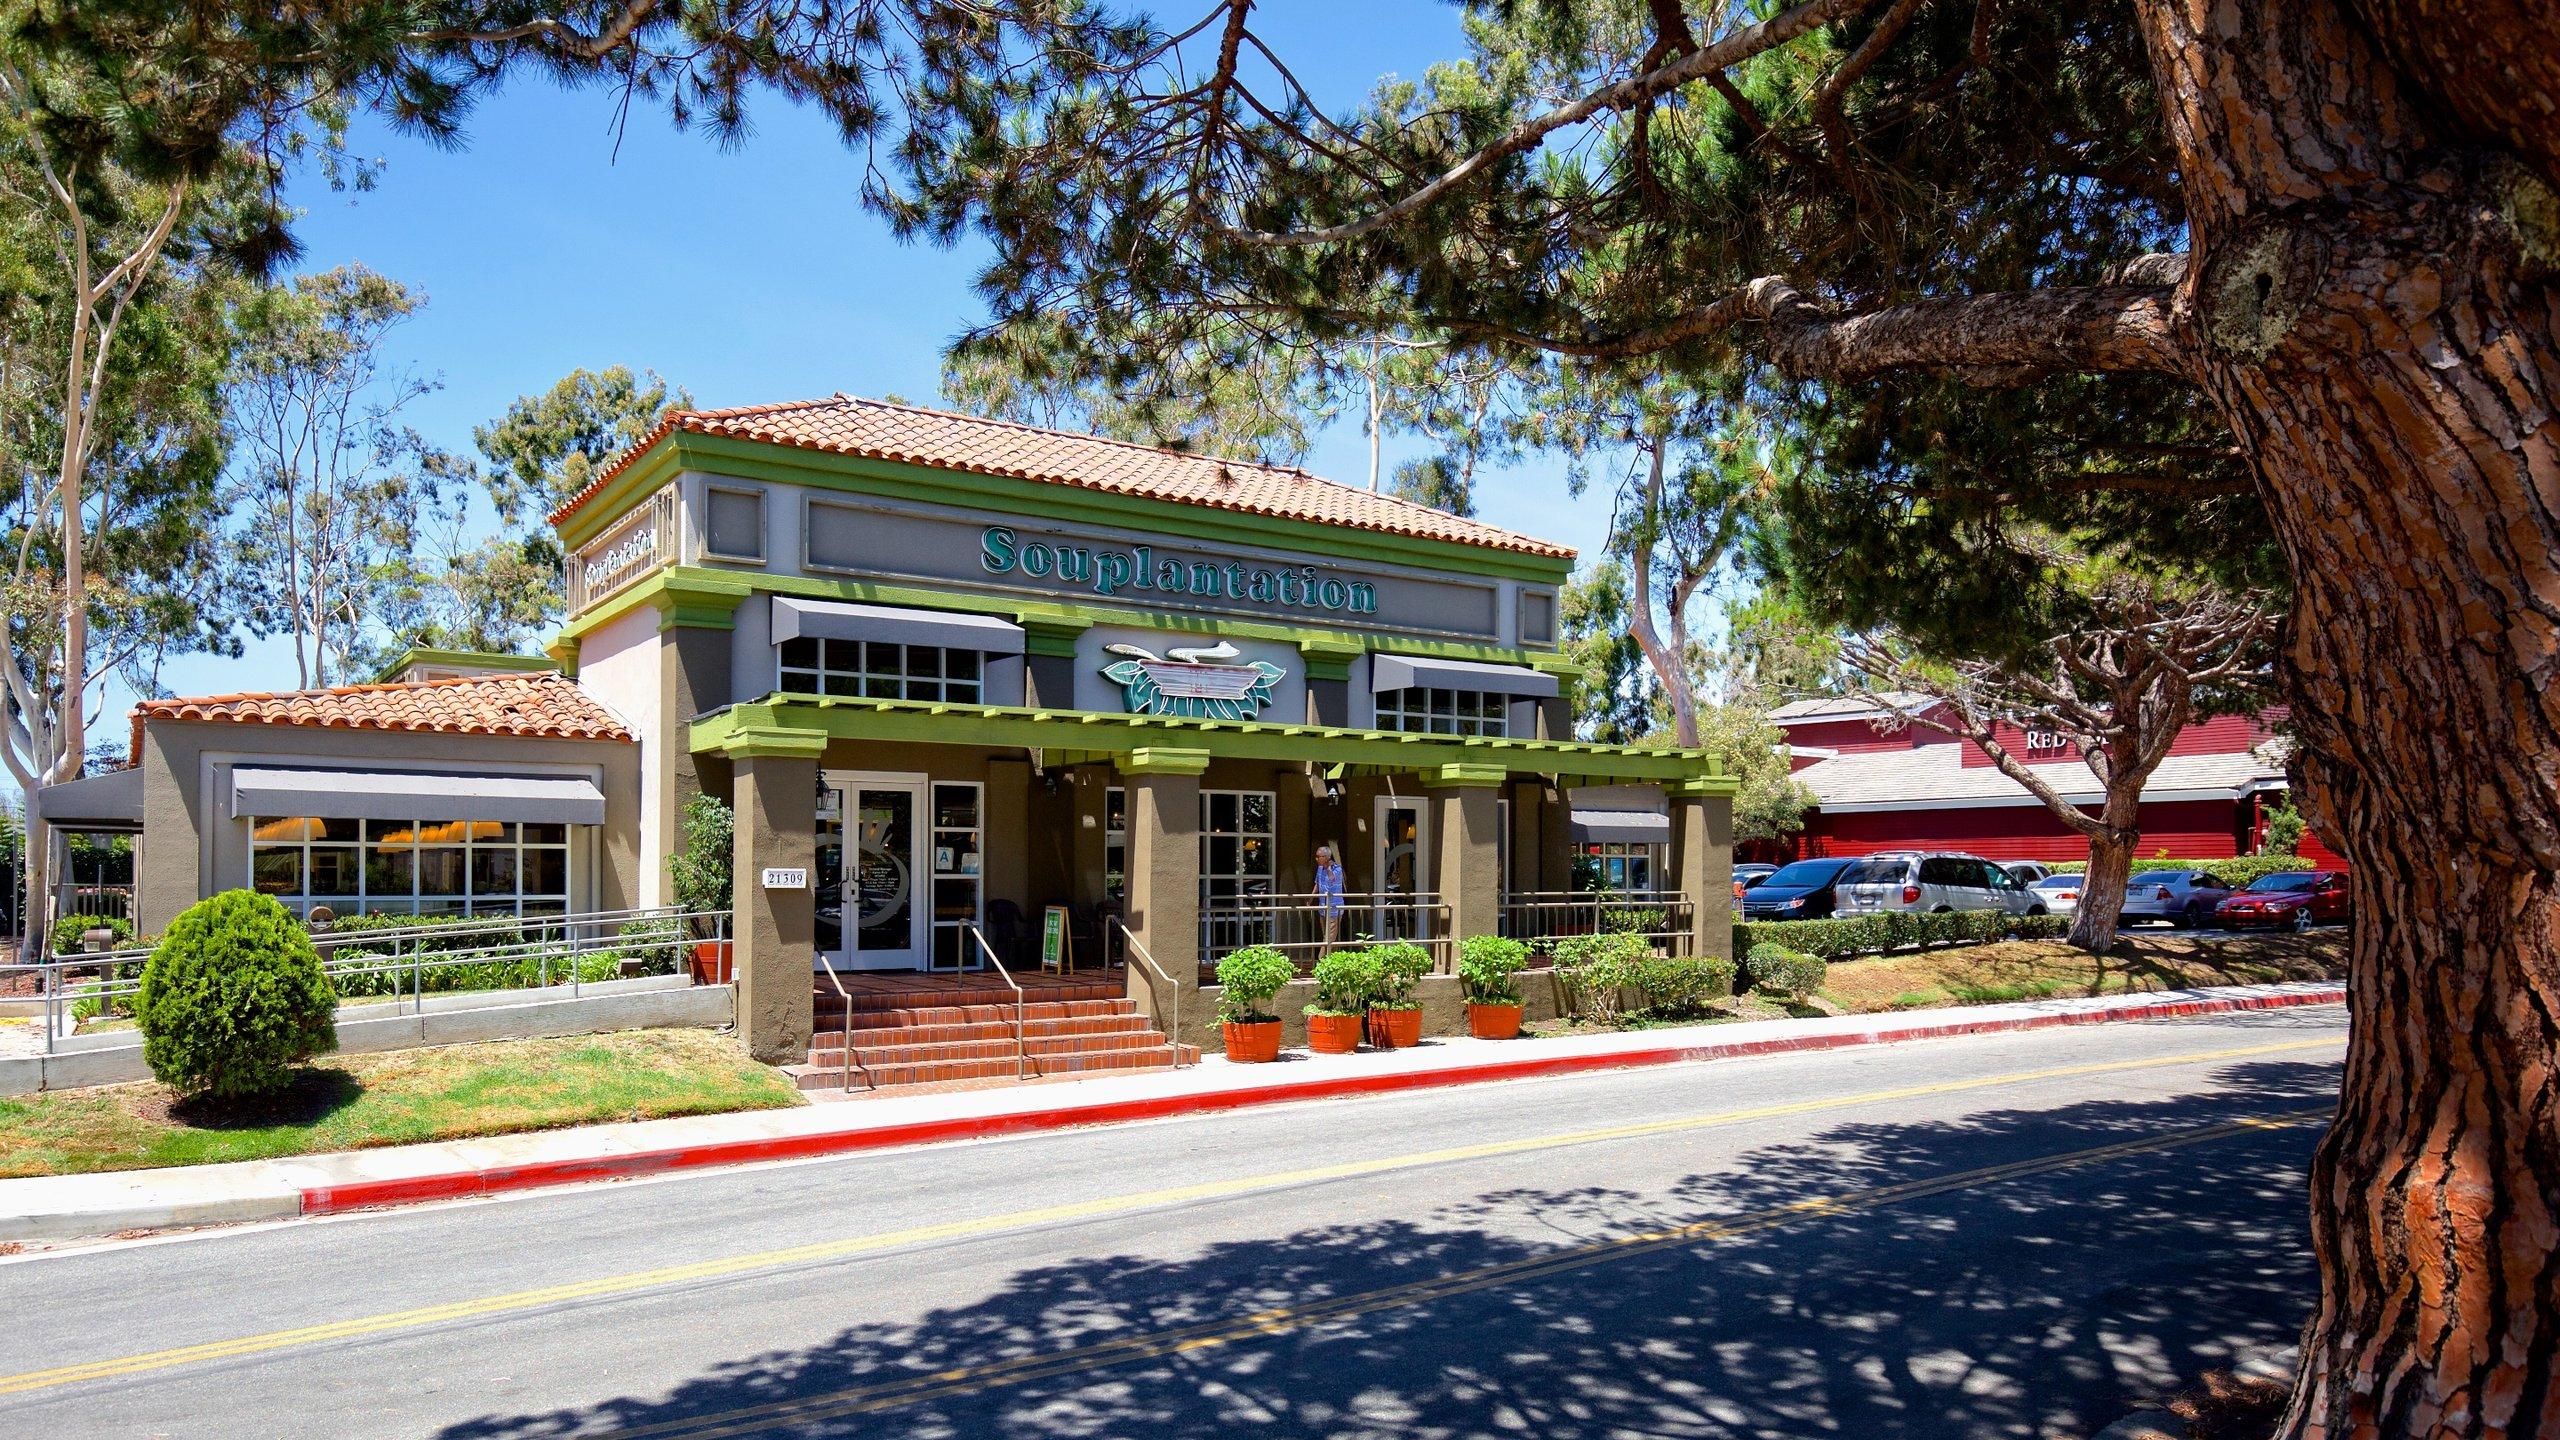 Torrance, California, United States of America